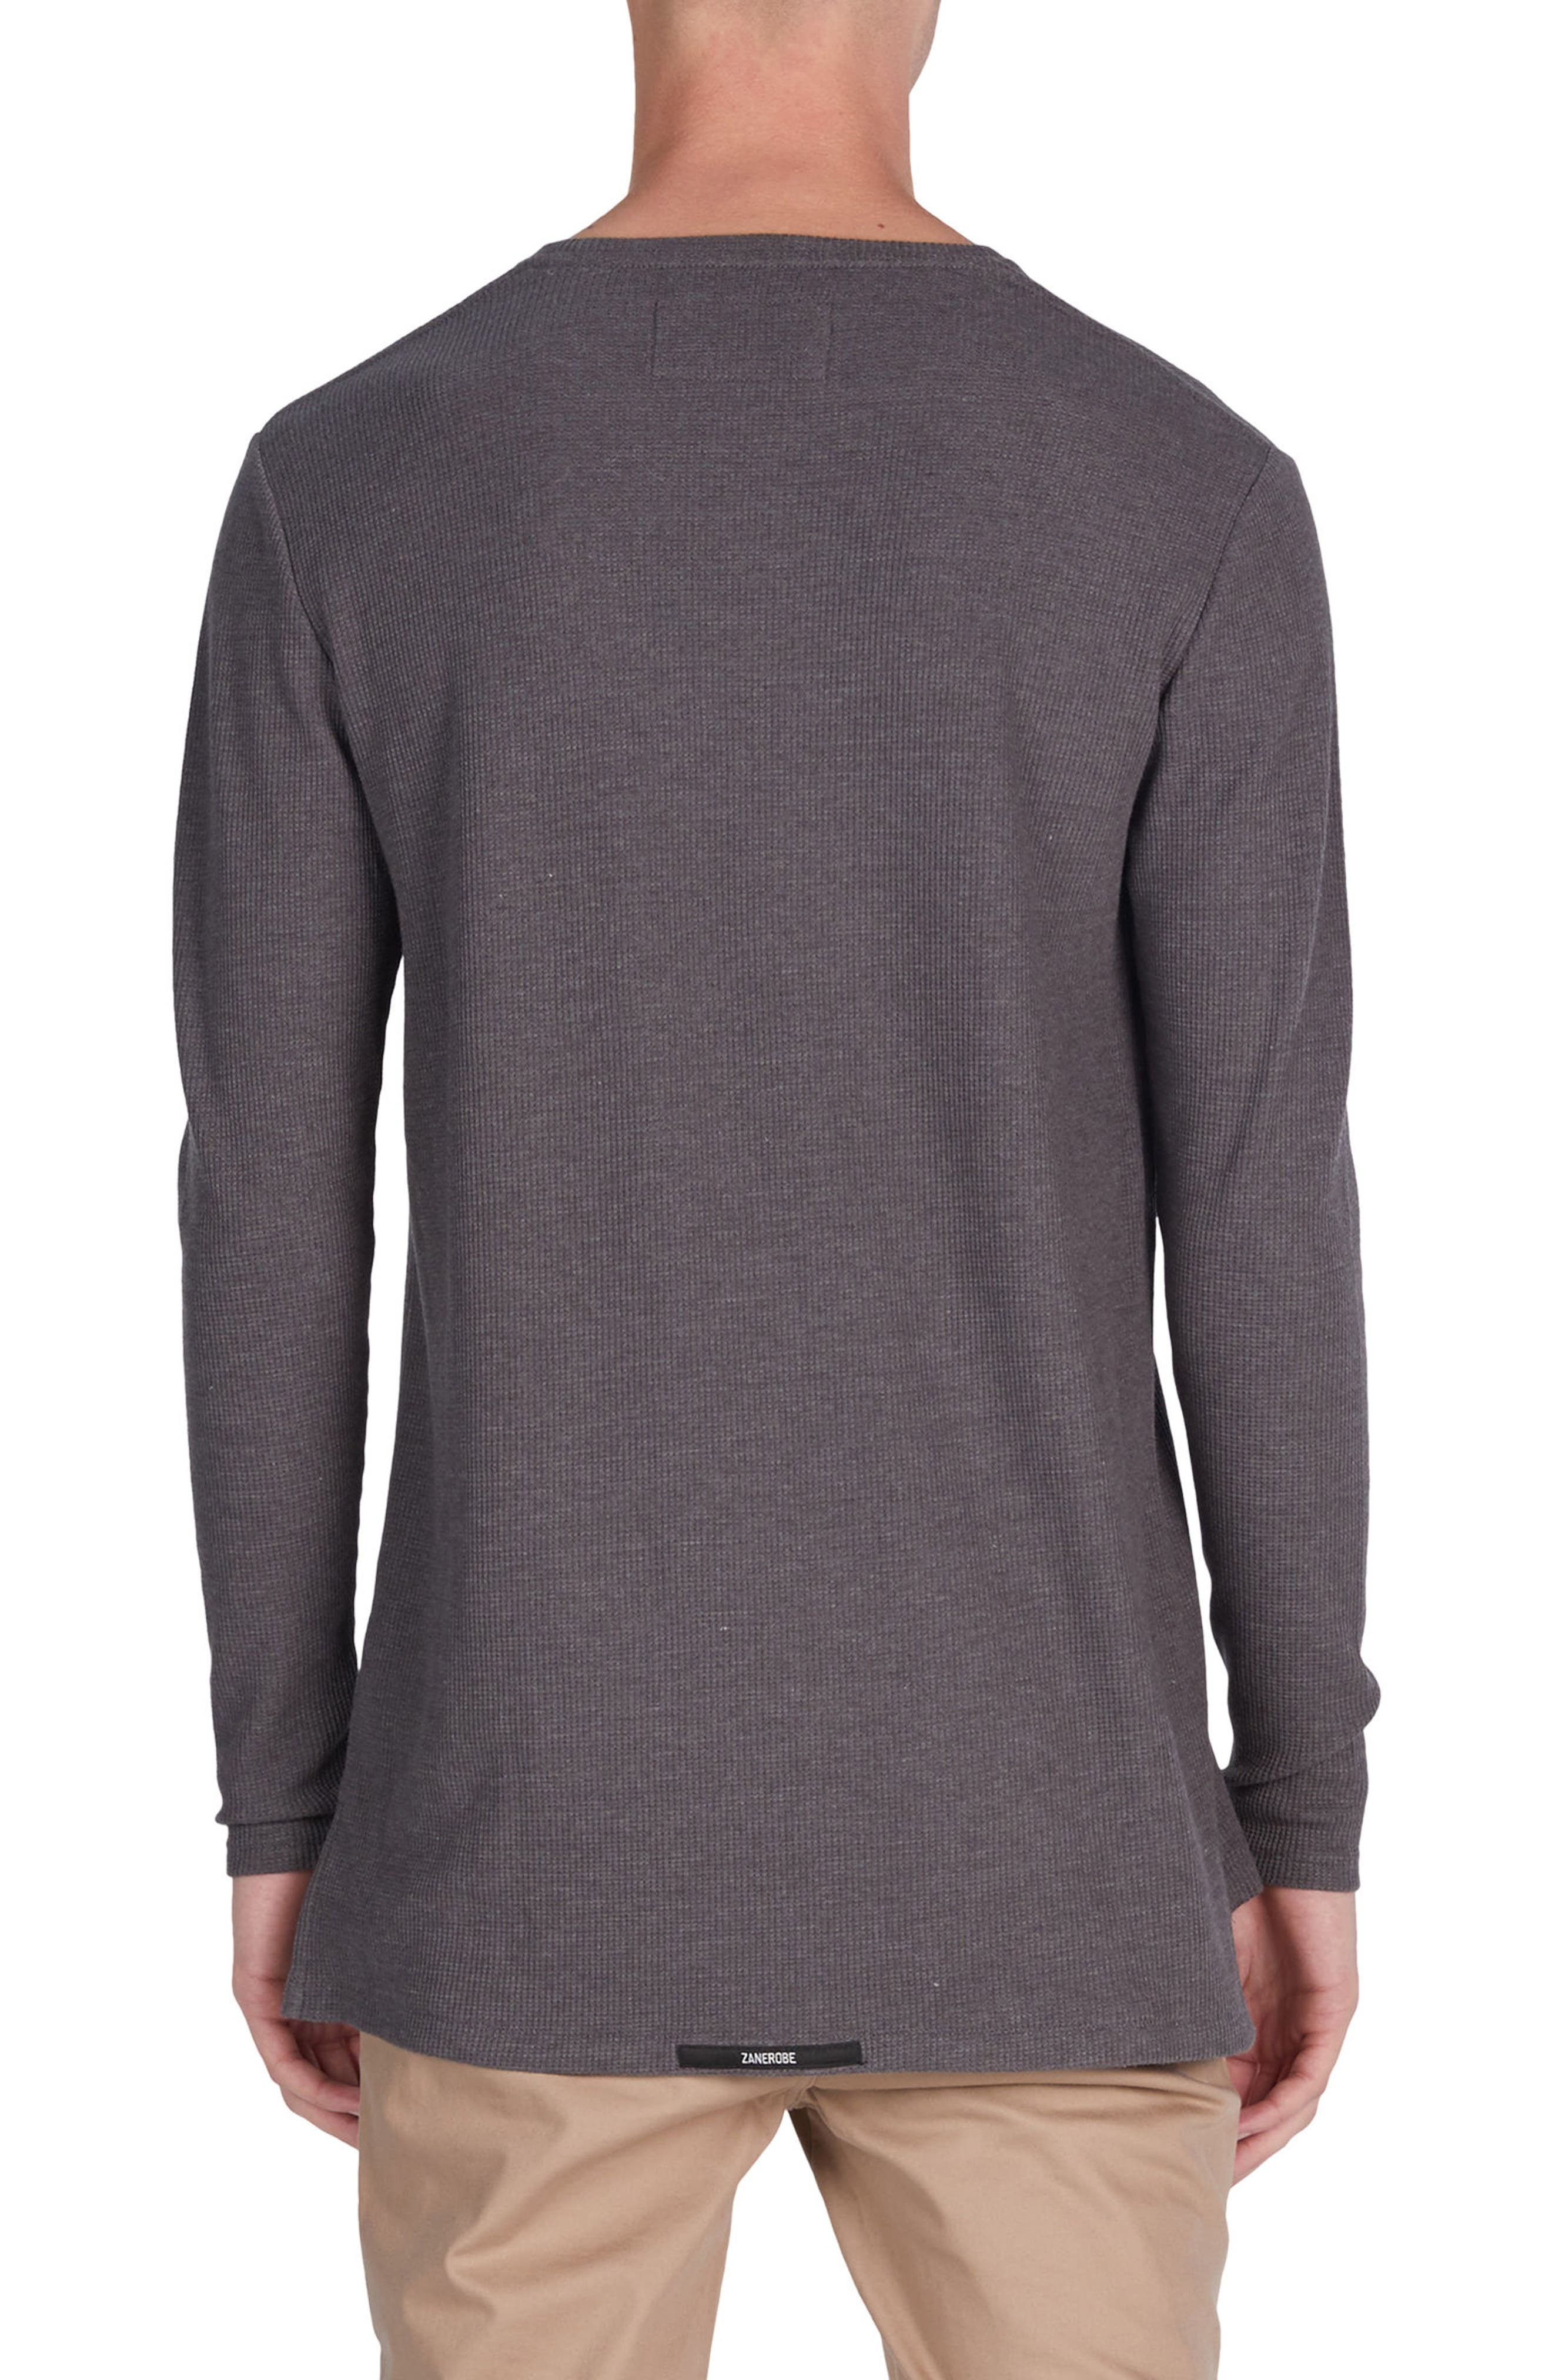 Flintlock Thermal T-Shirt,                             Alternate thumbnail 2, color,                             021